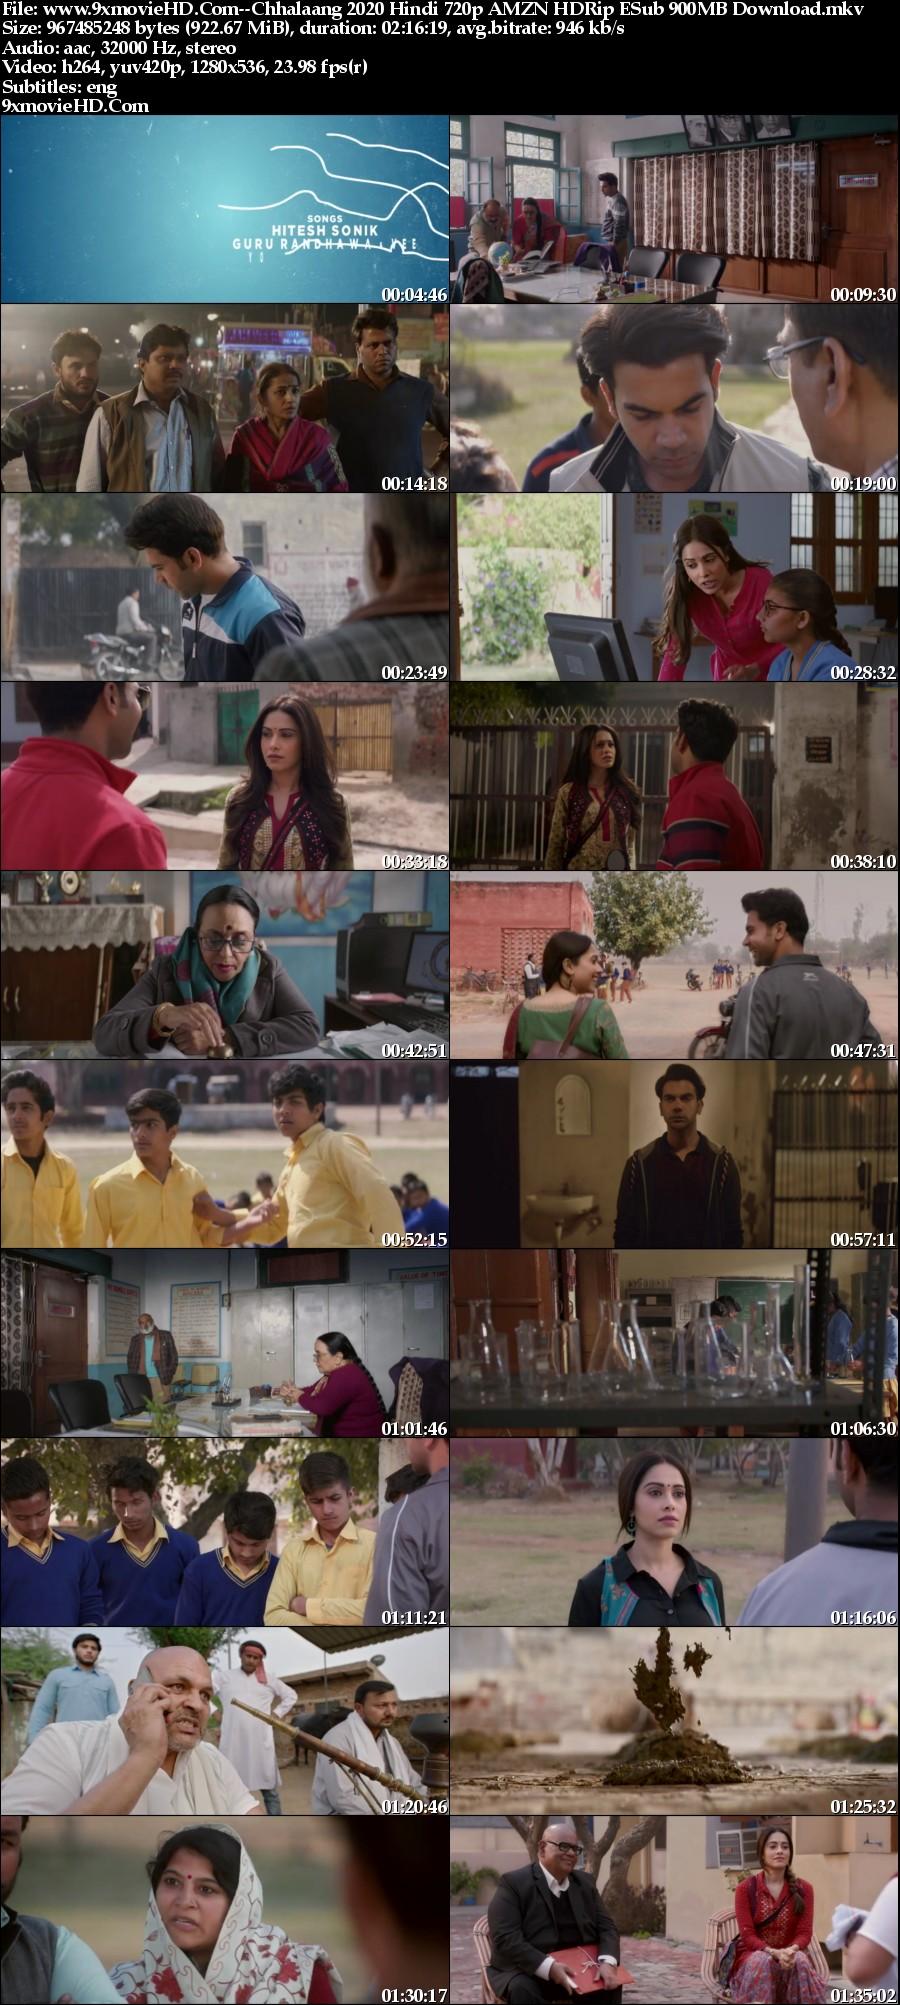 www-9xmovie-HD-Com-Chhalaang-2020-Hindi-720p-AMZN-HDRip-ESub-900-MB-Download